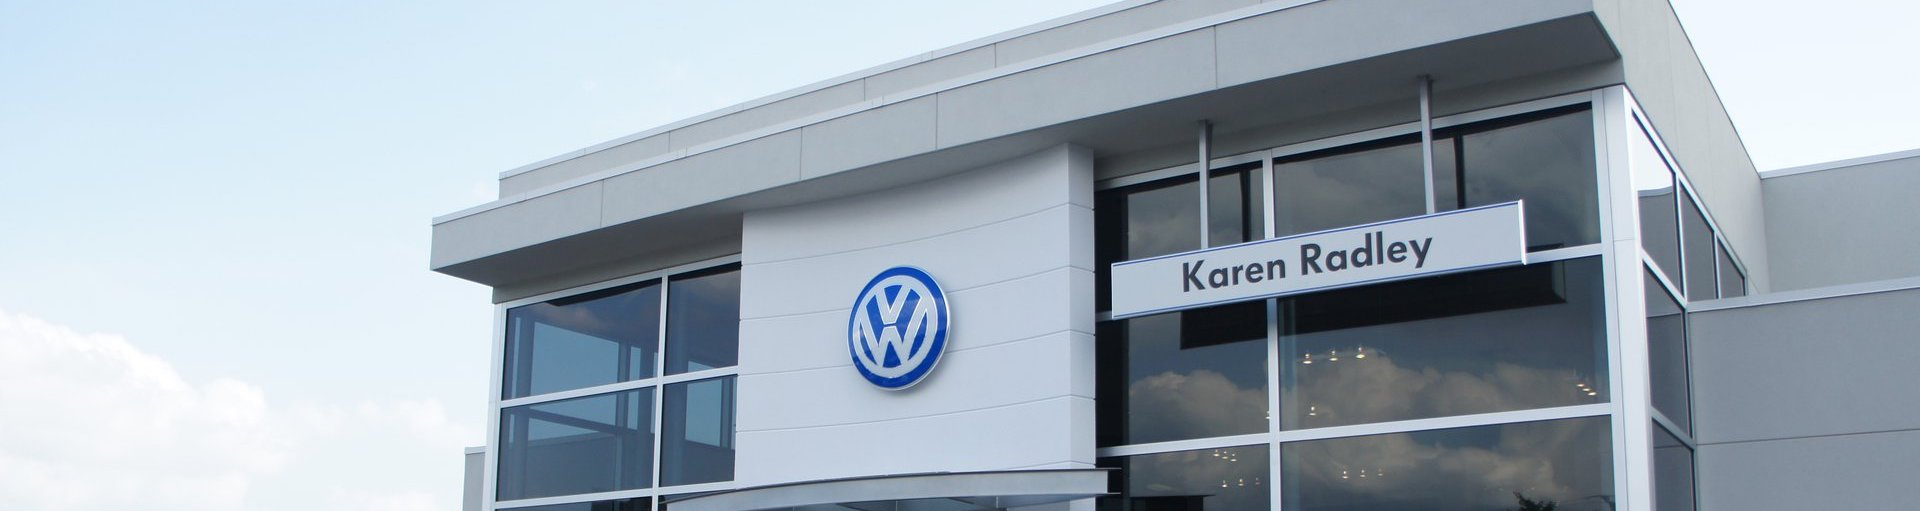 Karen Radley Volkswagen VW Service Near Lorton, VA